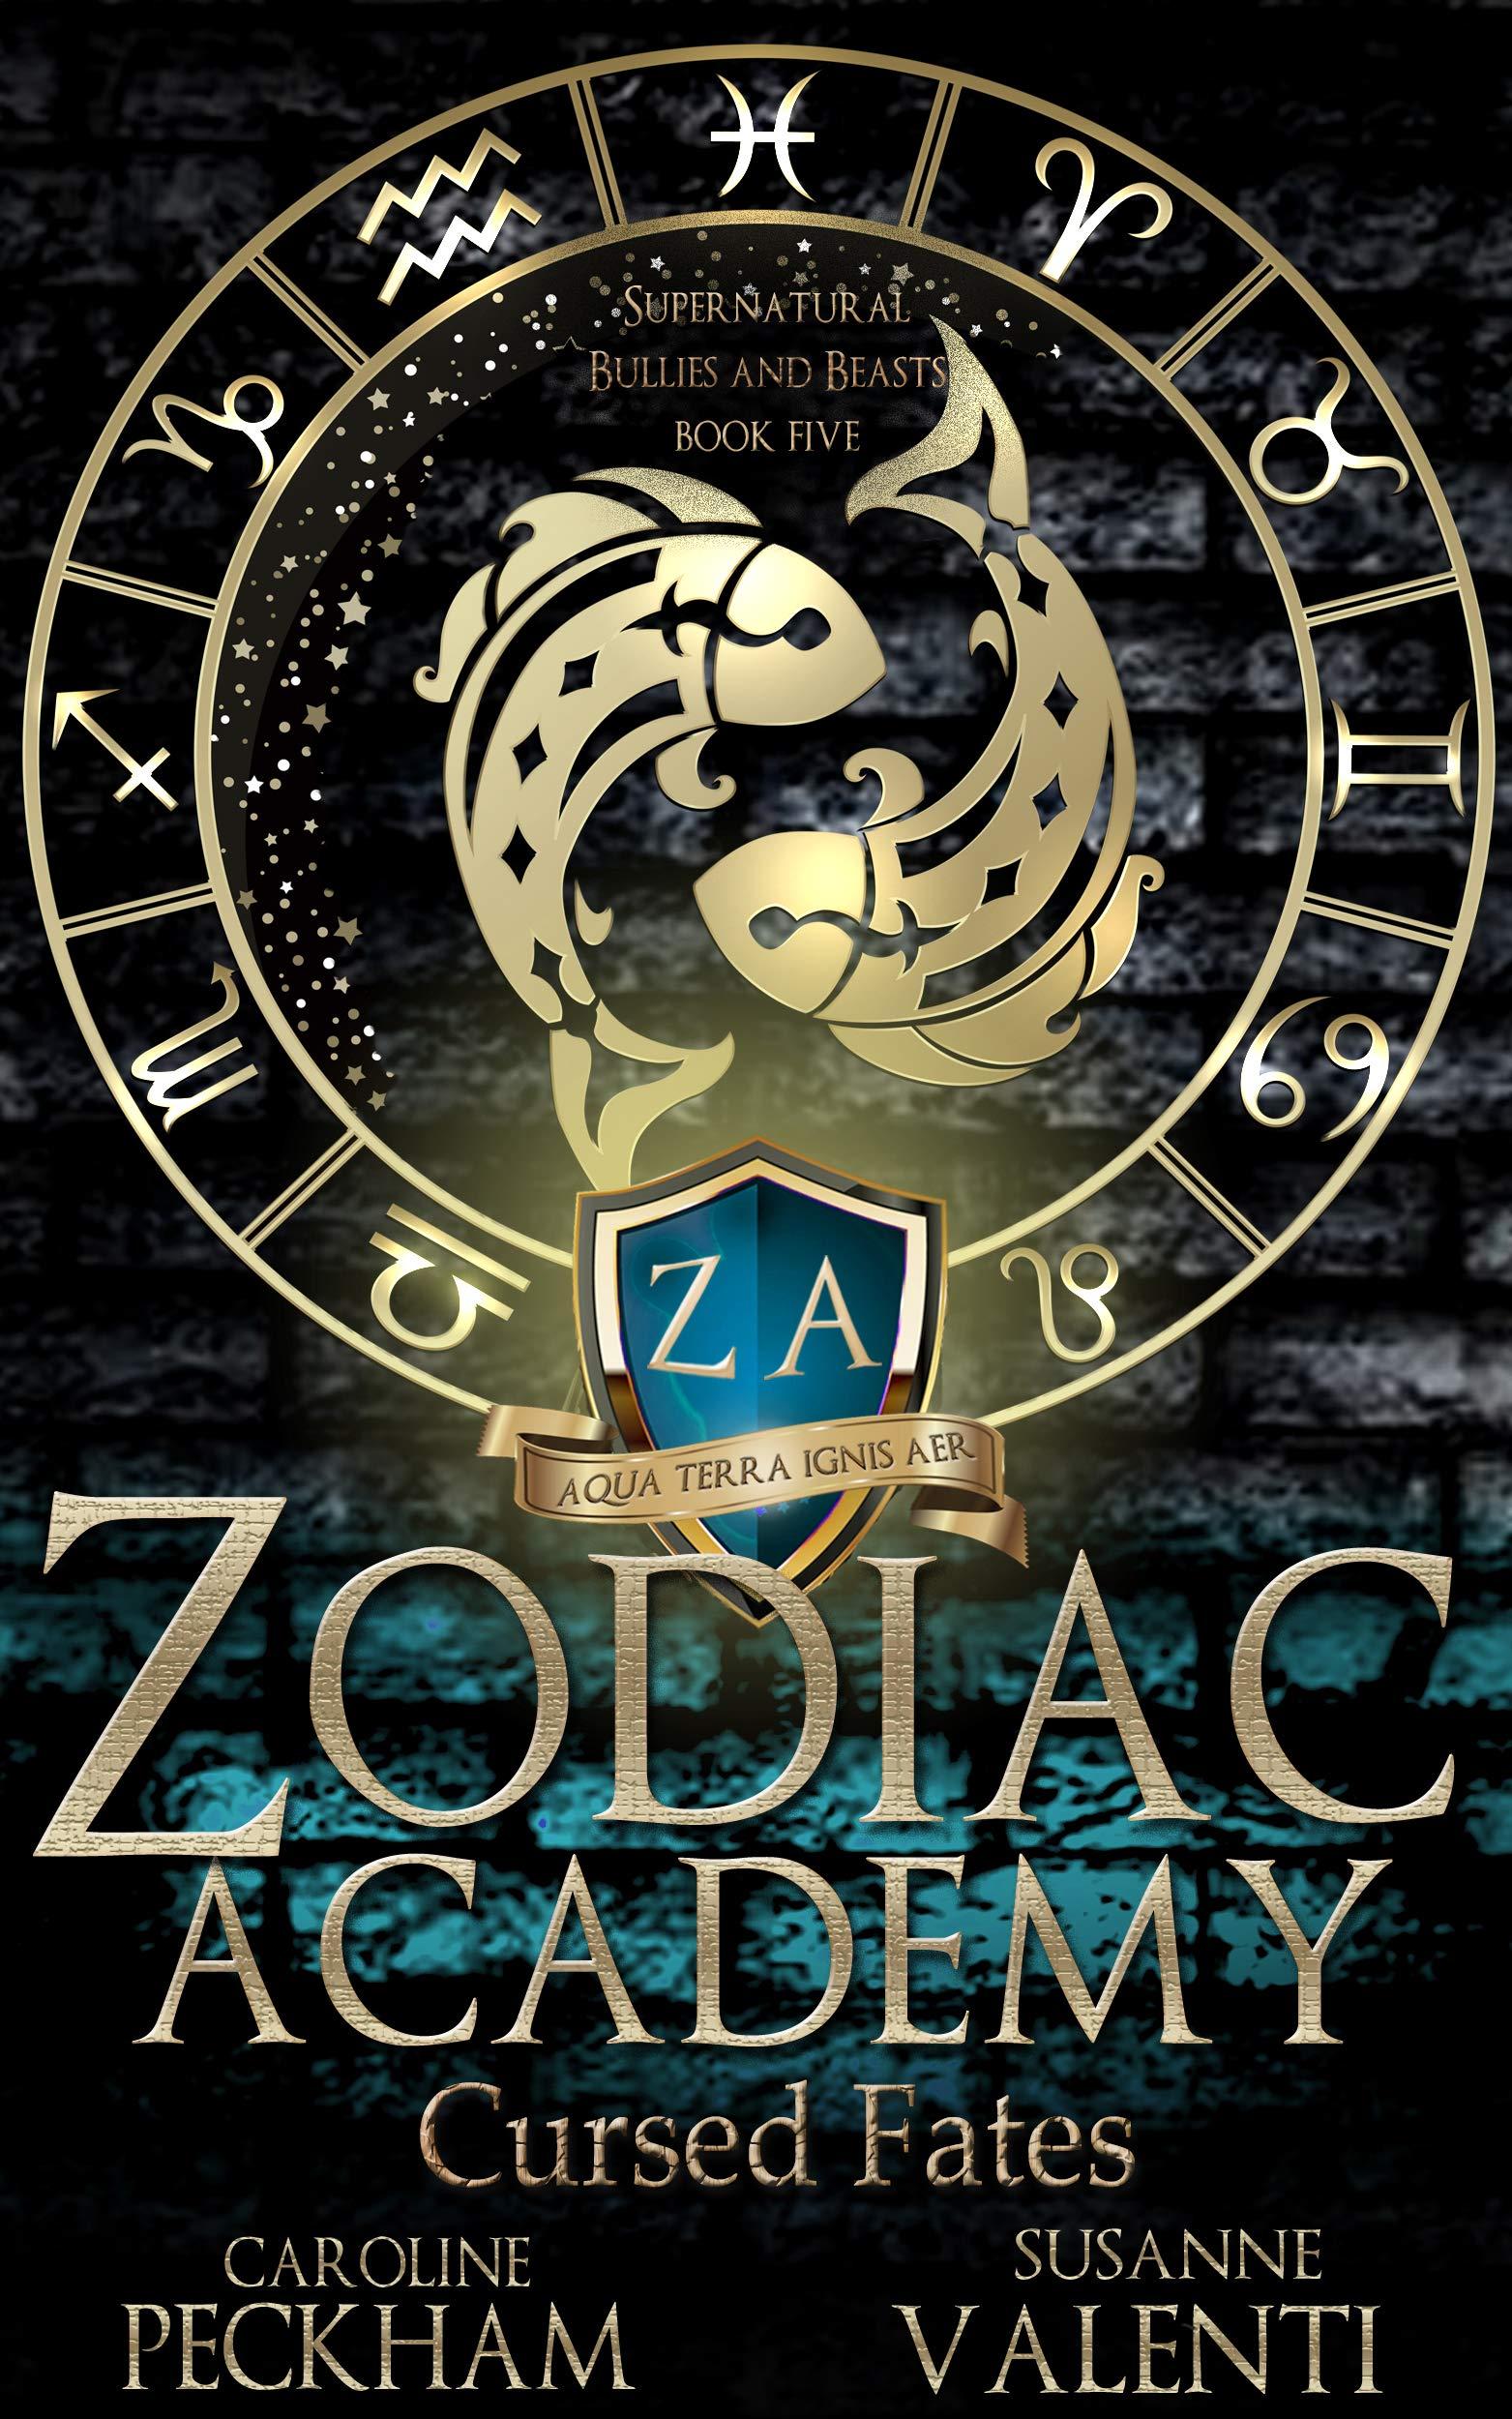 Zodiac Academy 5: Cursed Fates: An Academy Bully Romance (Supernatural Bullies and Beasts)